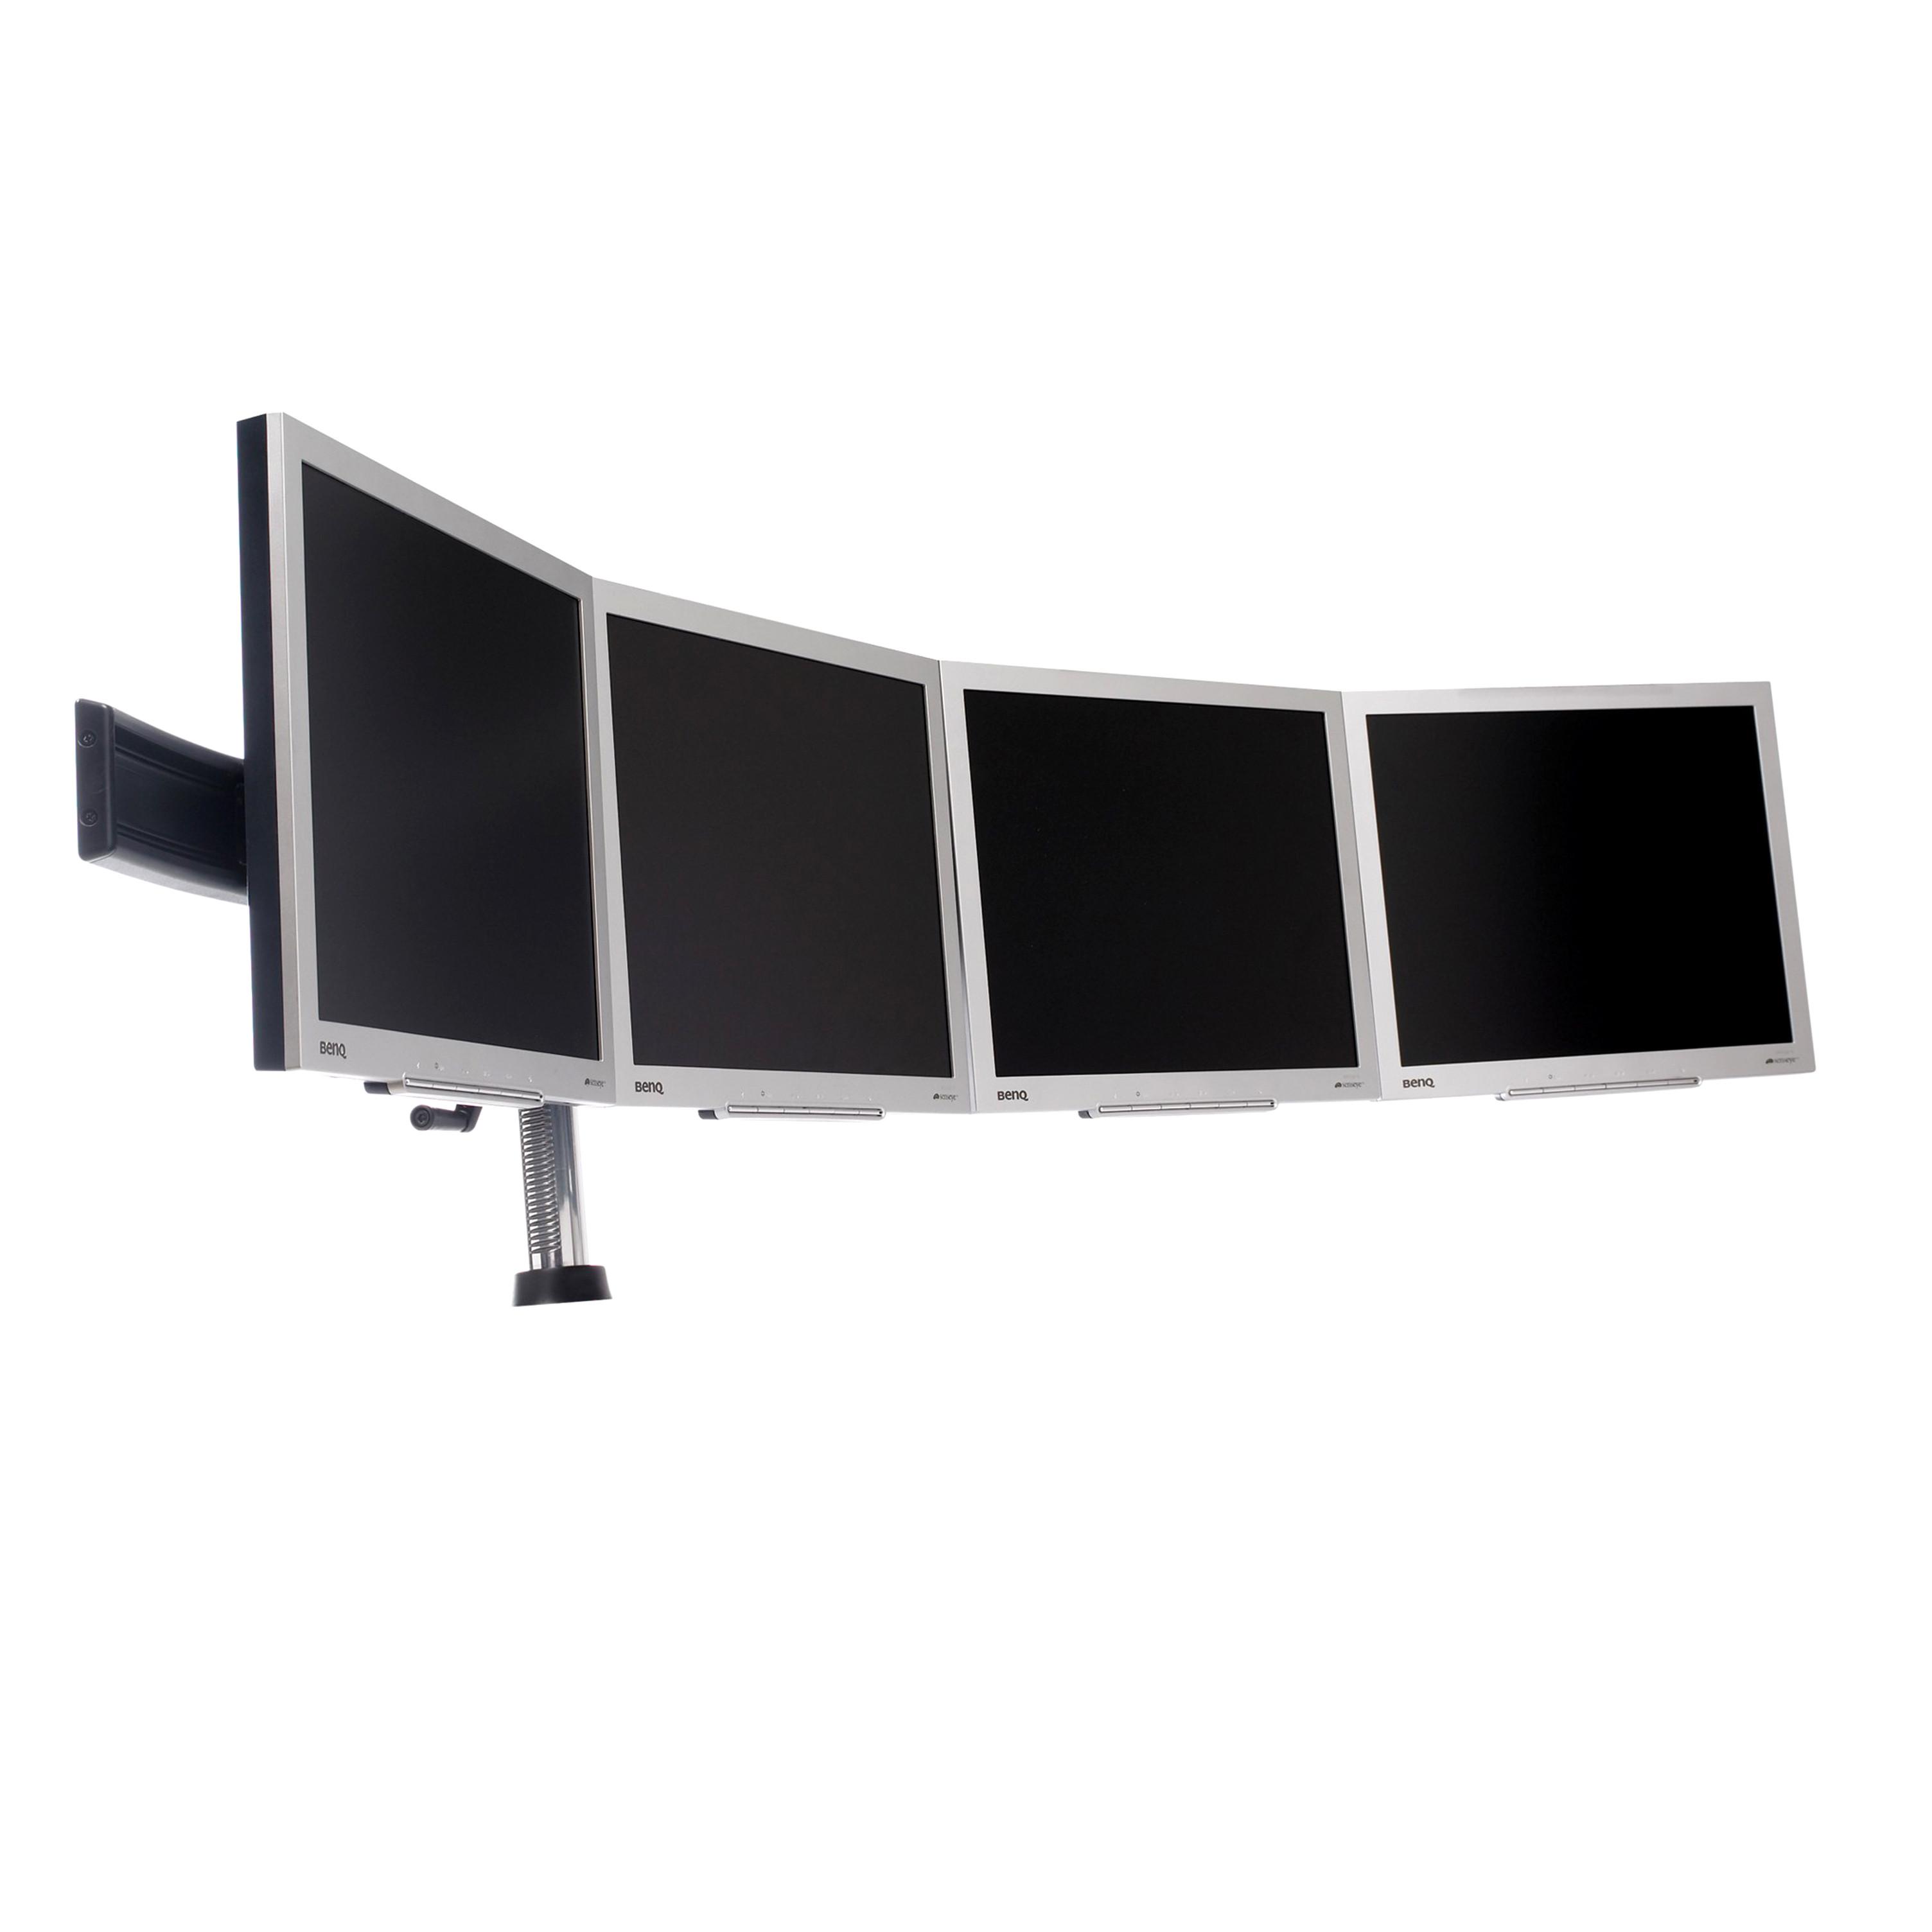 Multi-Monitor Display